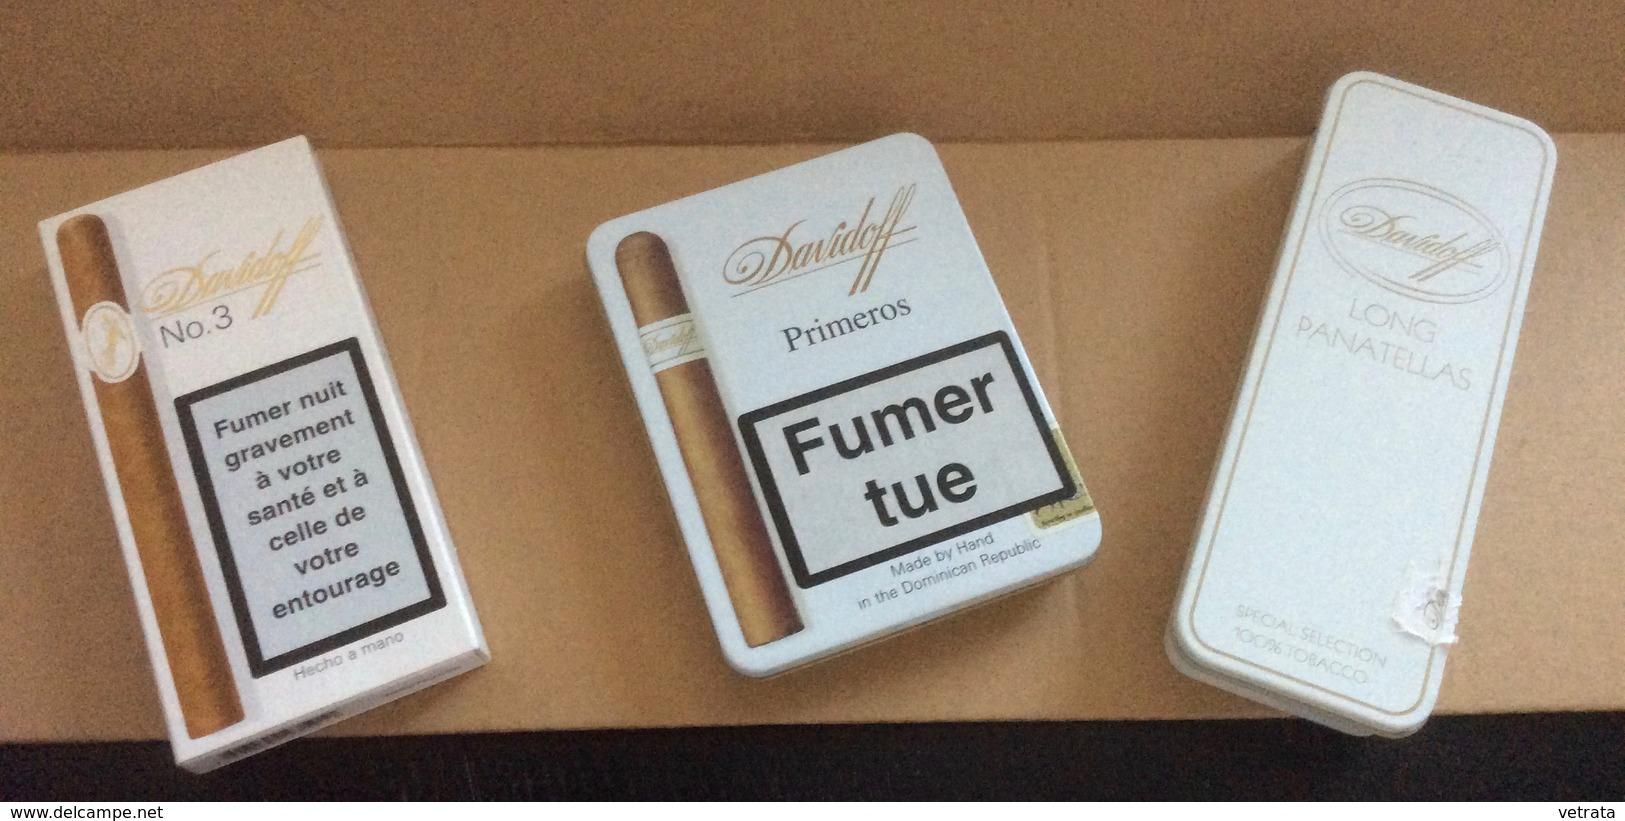 Lot De 4 Boites (vides)  Davidoff : Primeros & Long Panatellas (fer) - Mini Cigarillos (Bois) & N°3 (Carton) - Boites à Tabac Vides